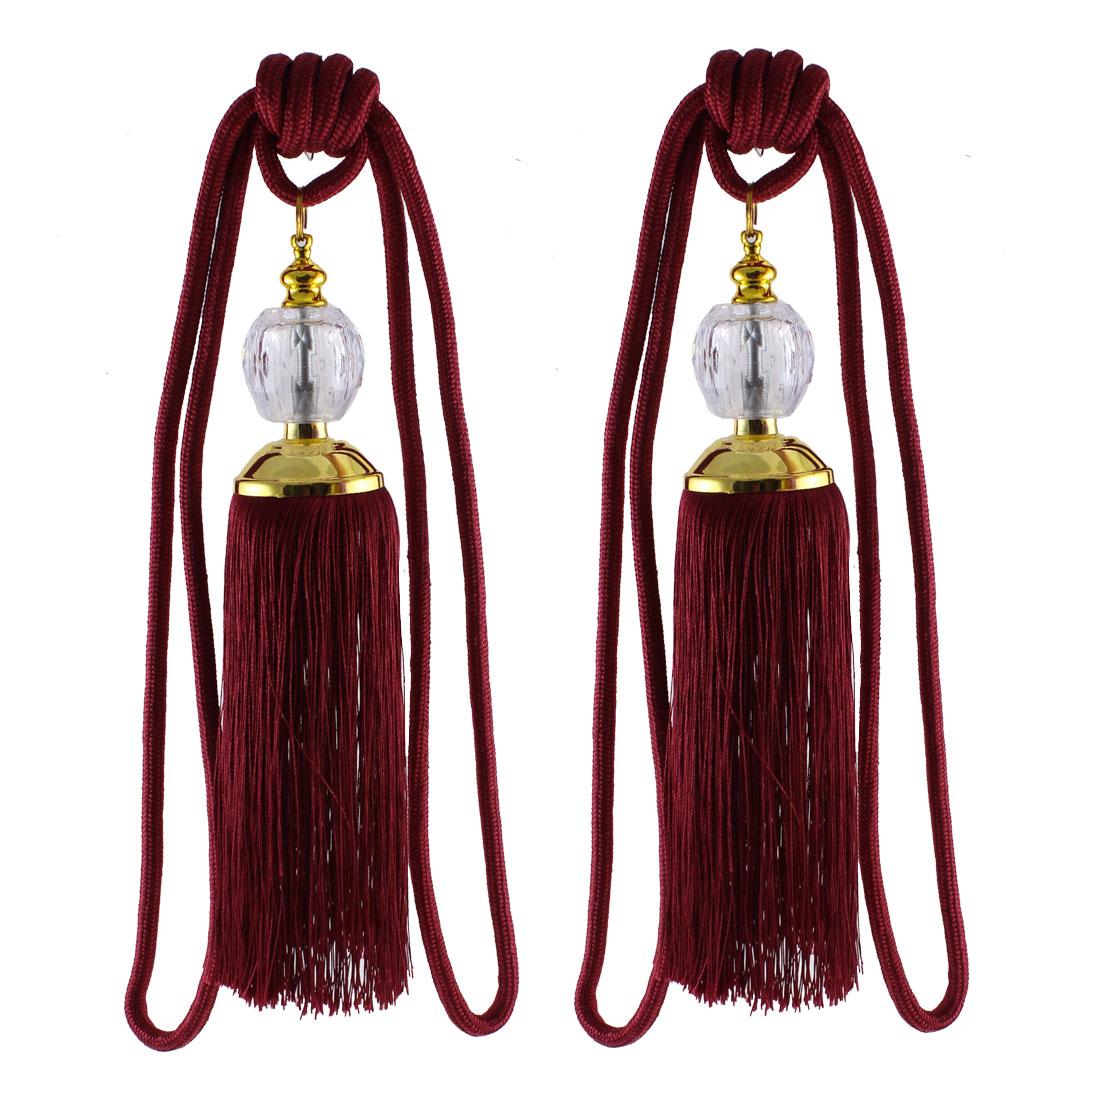 Burgundy Dual Rope Cord Curtain Tassels Tie Backs Holdback Decor Pair